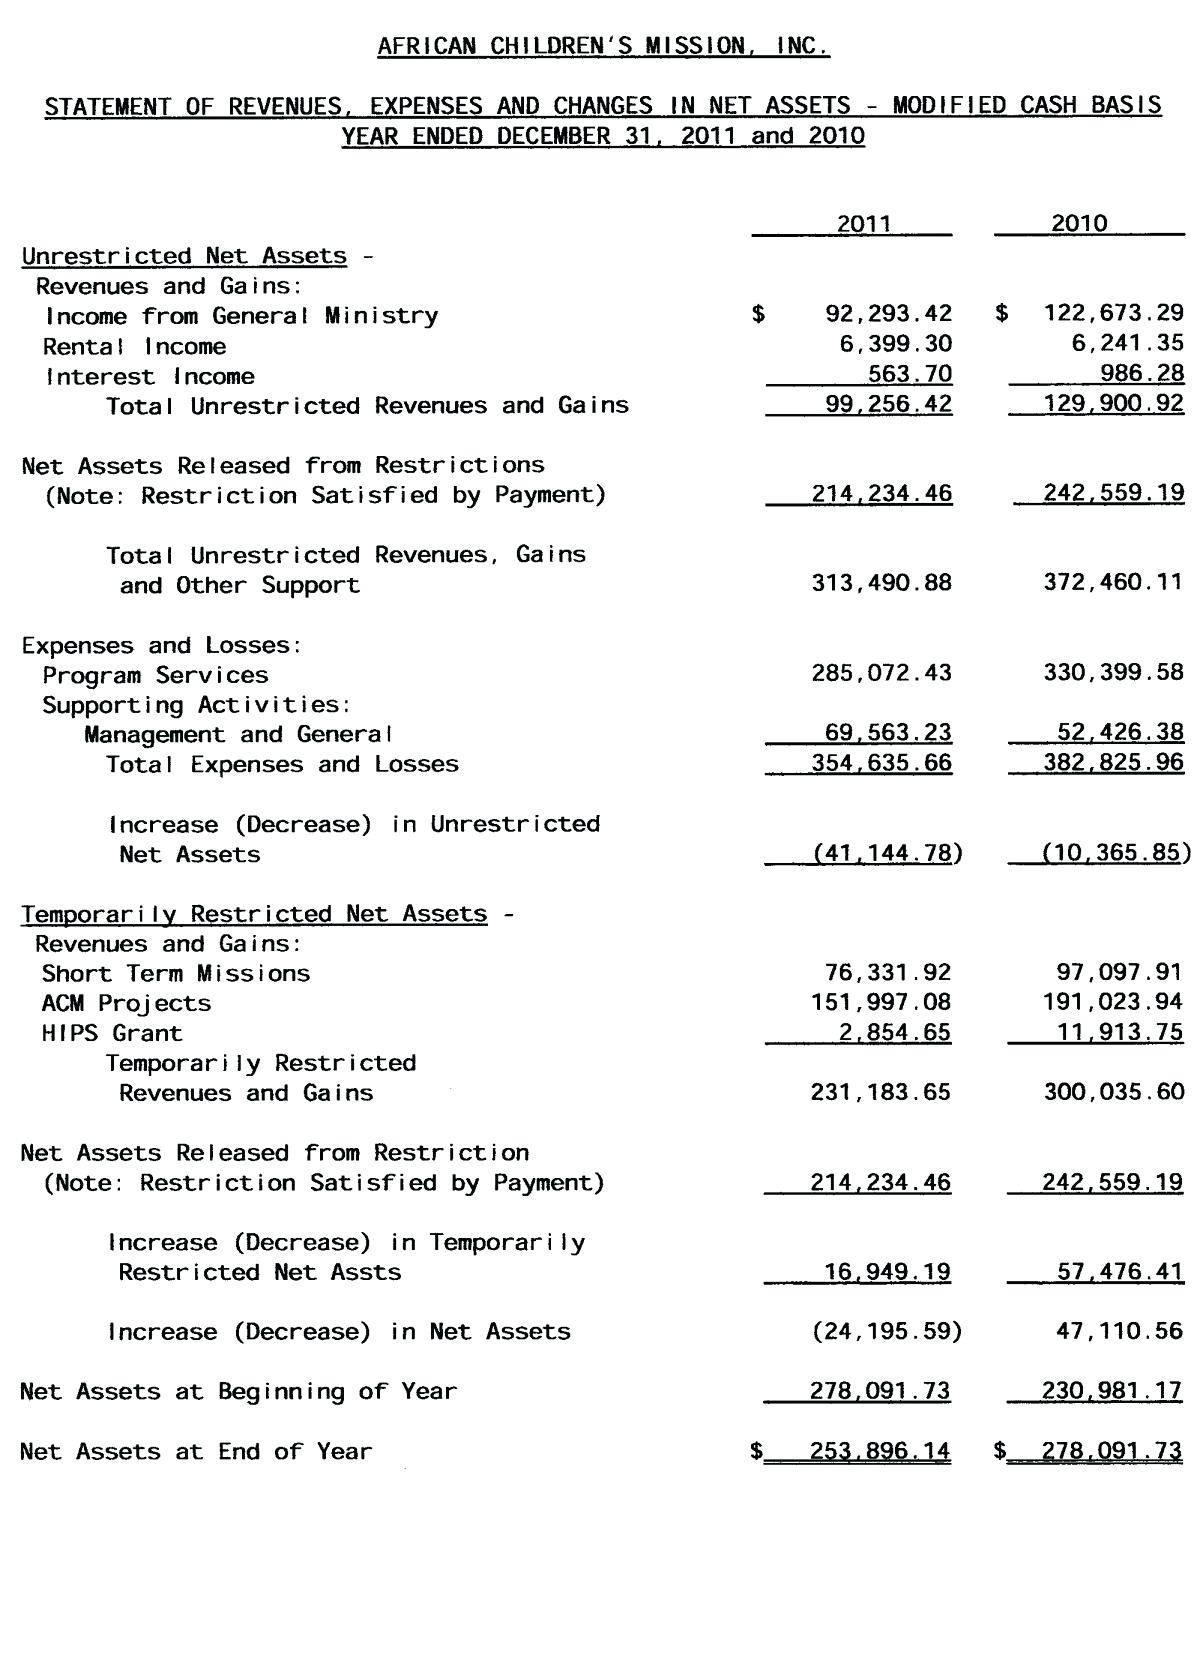 Trading Profit And Loss Account And Balance Sheet Example Pdf